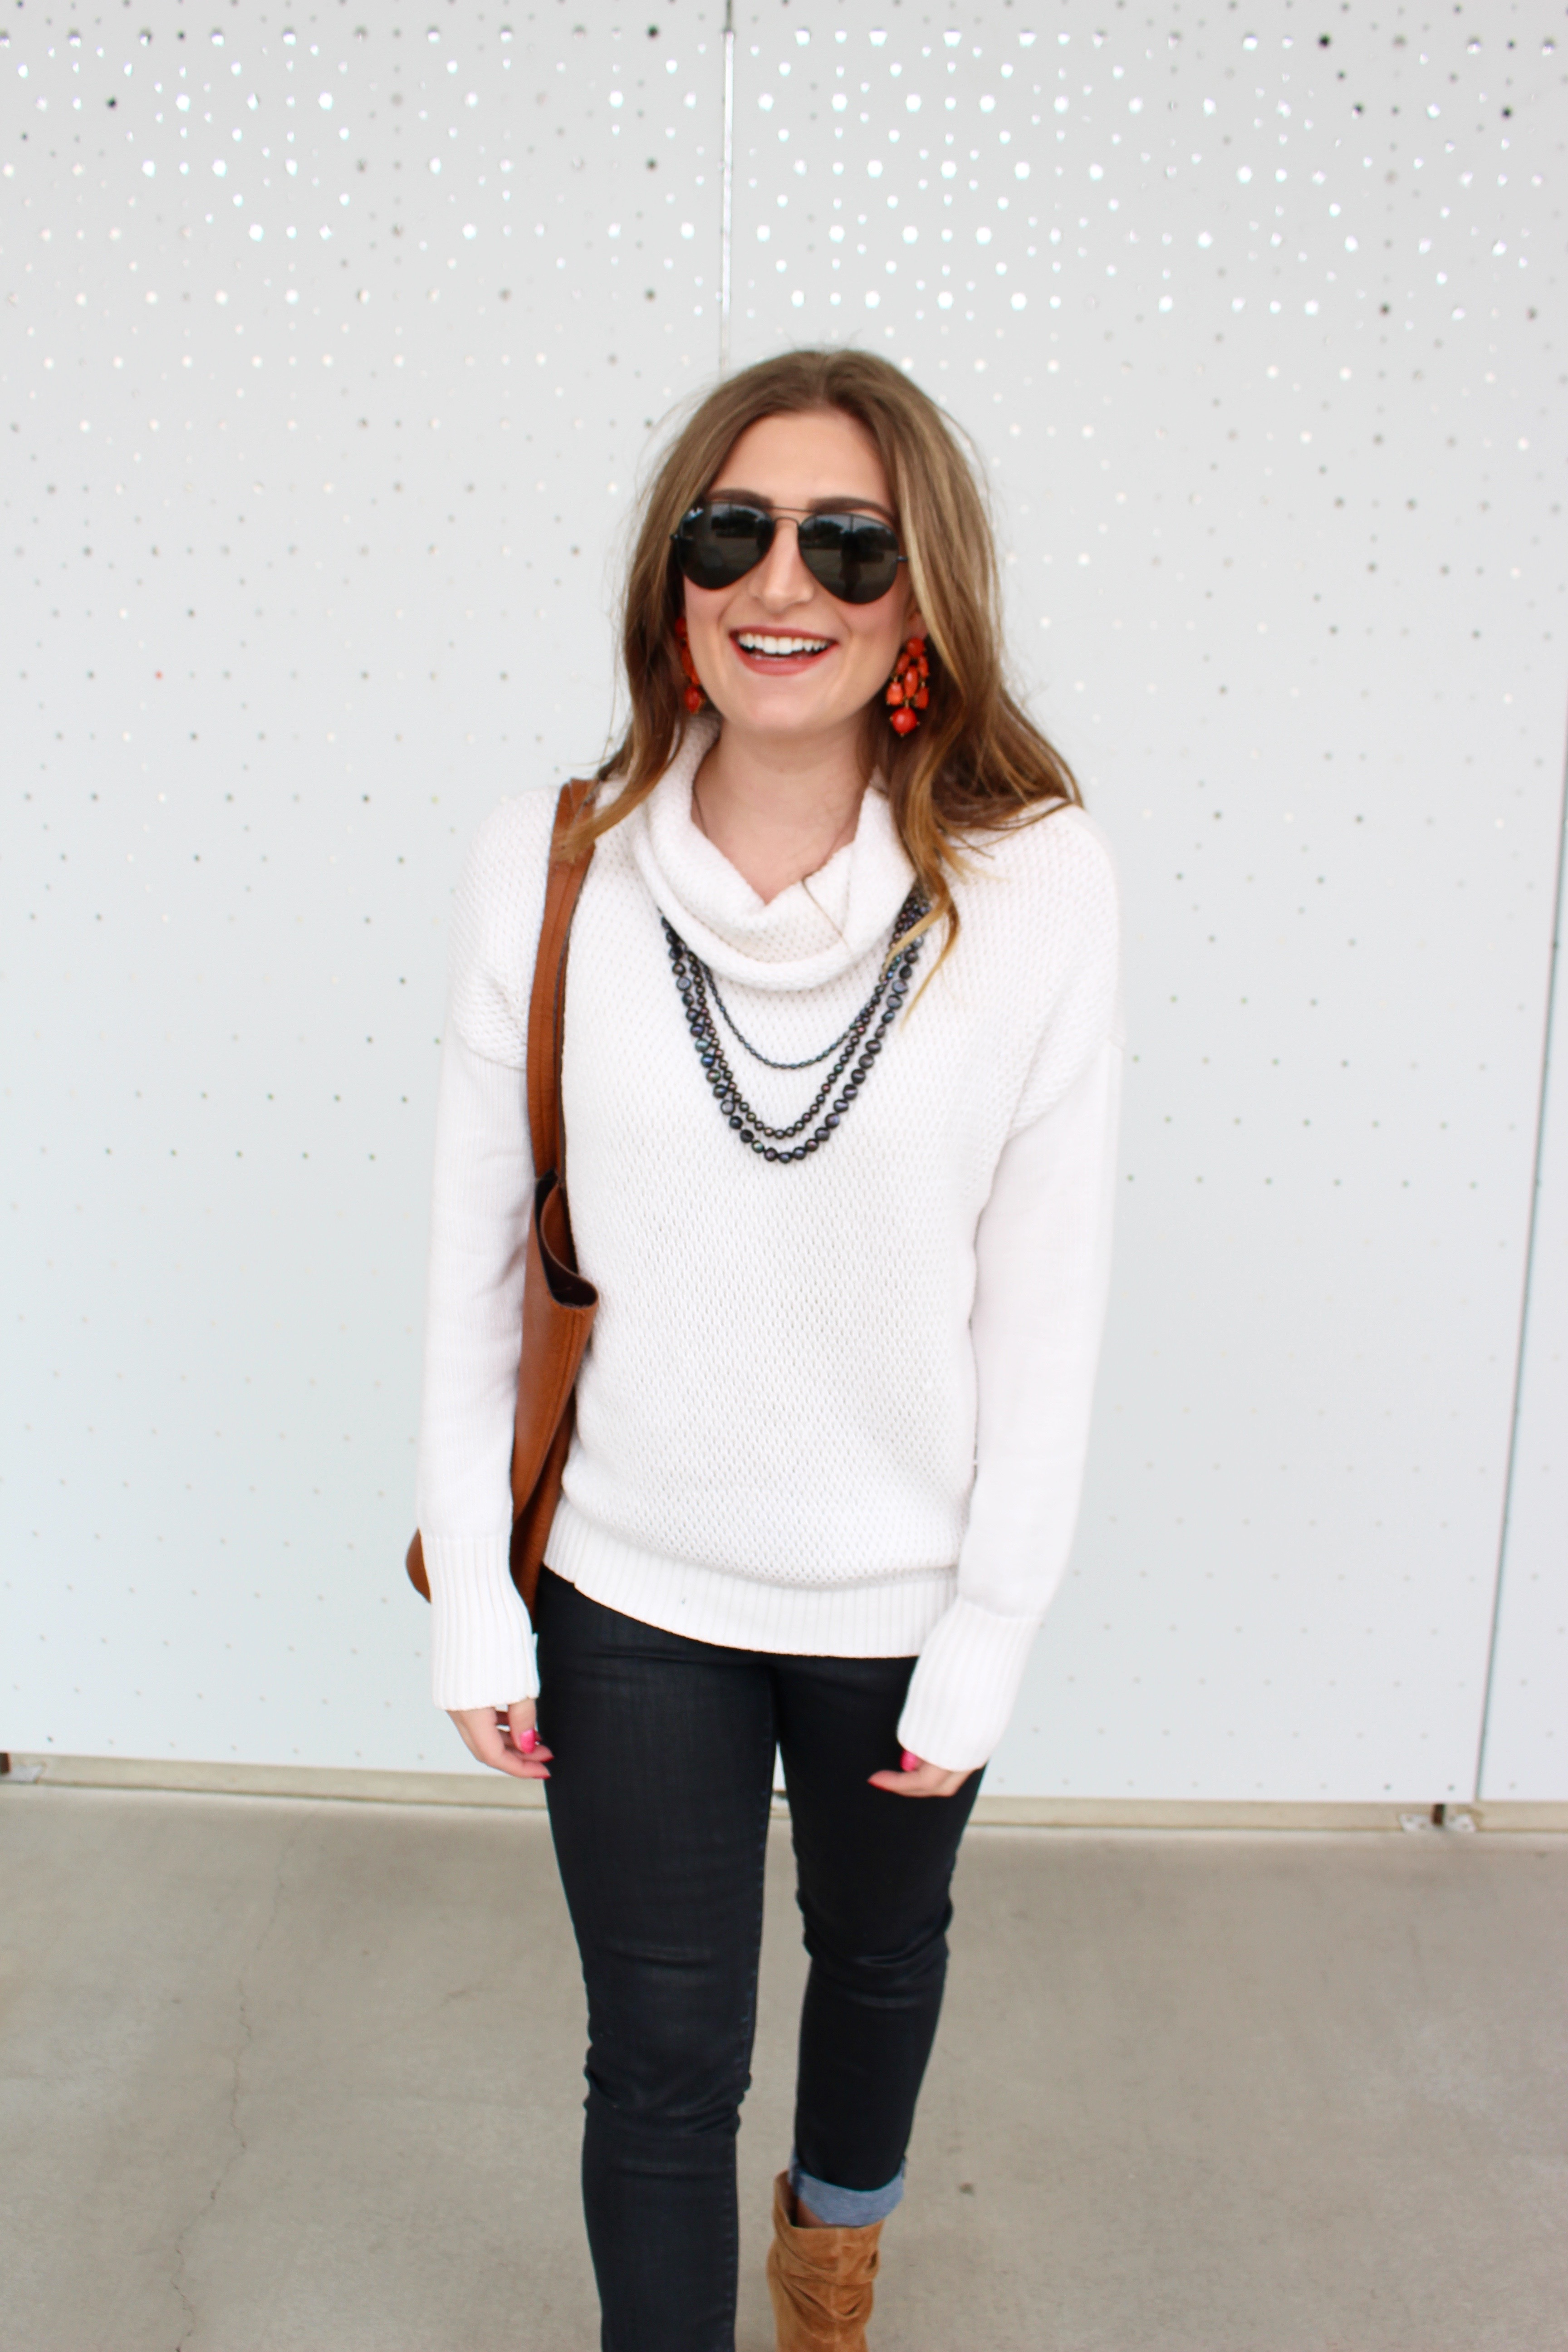 smiling in white